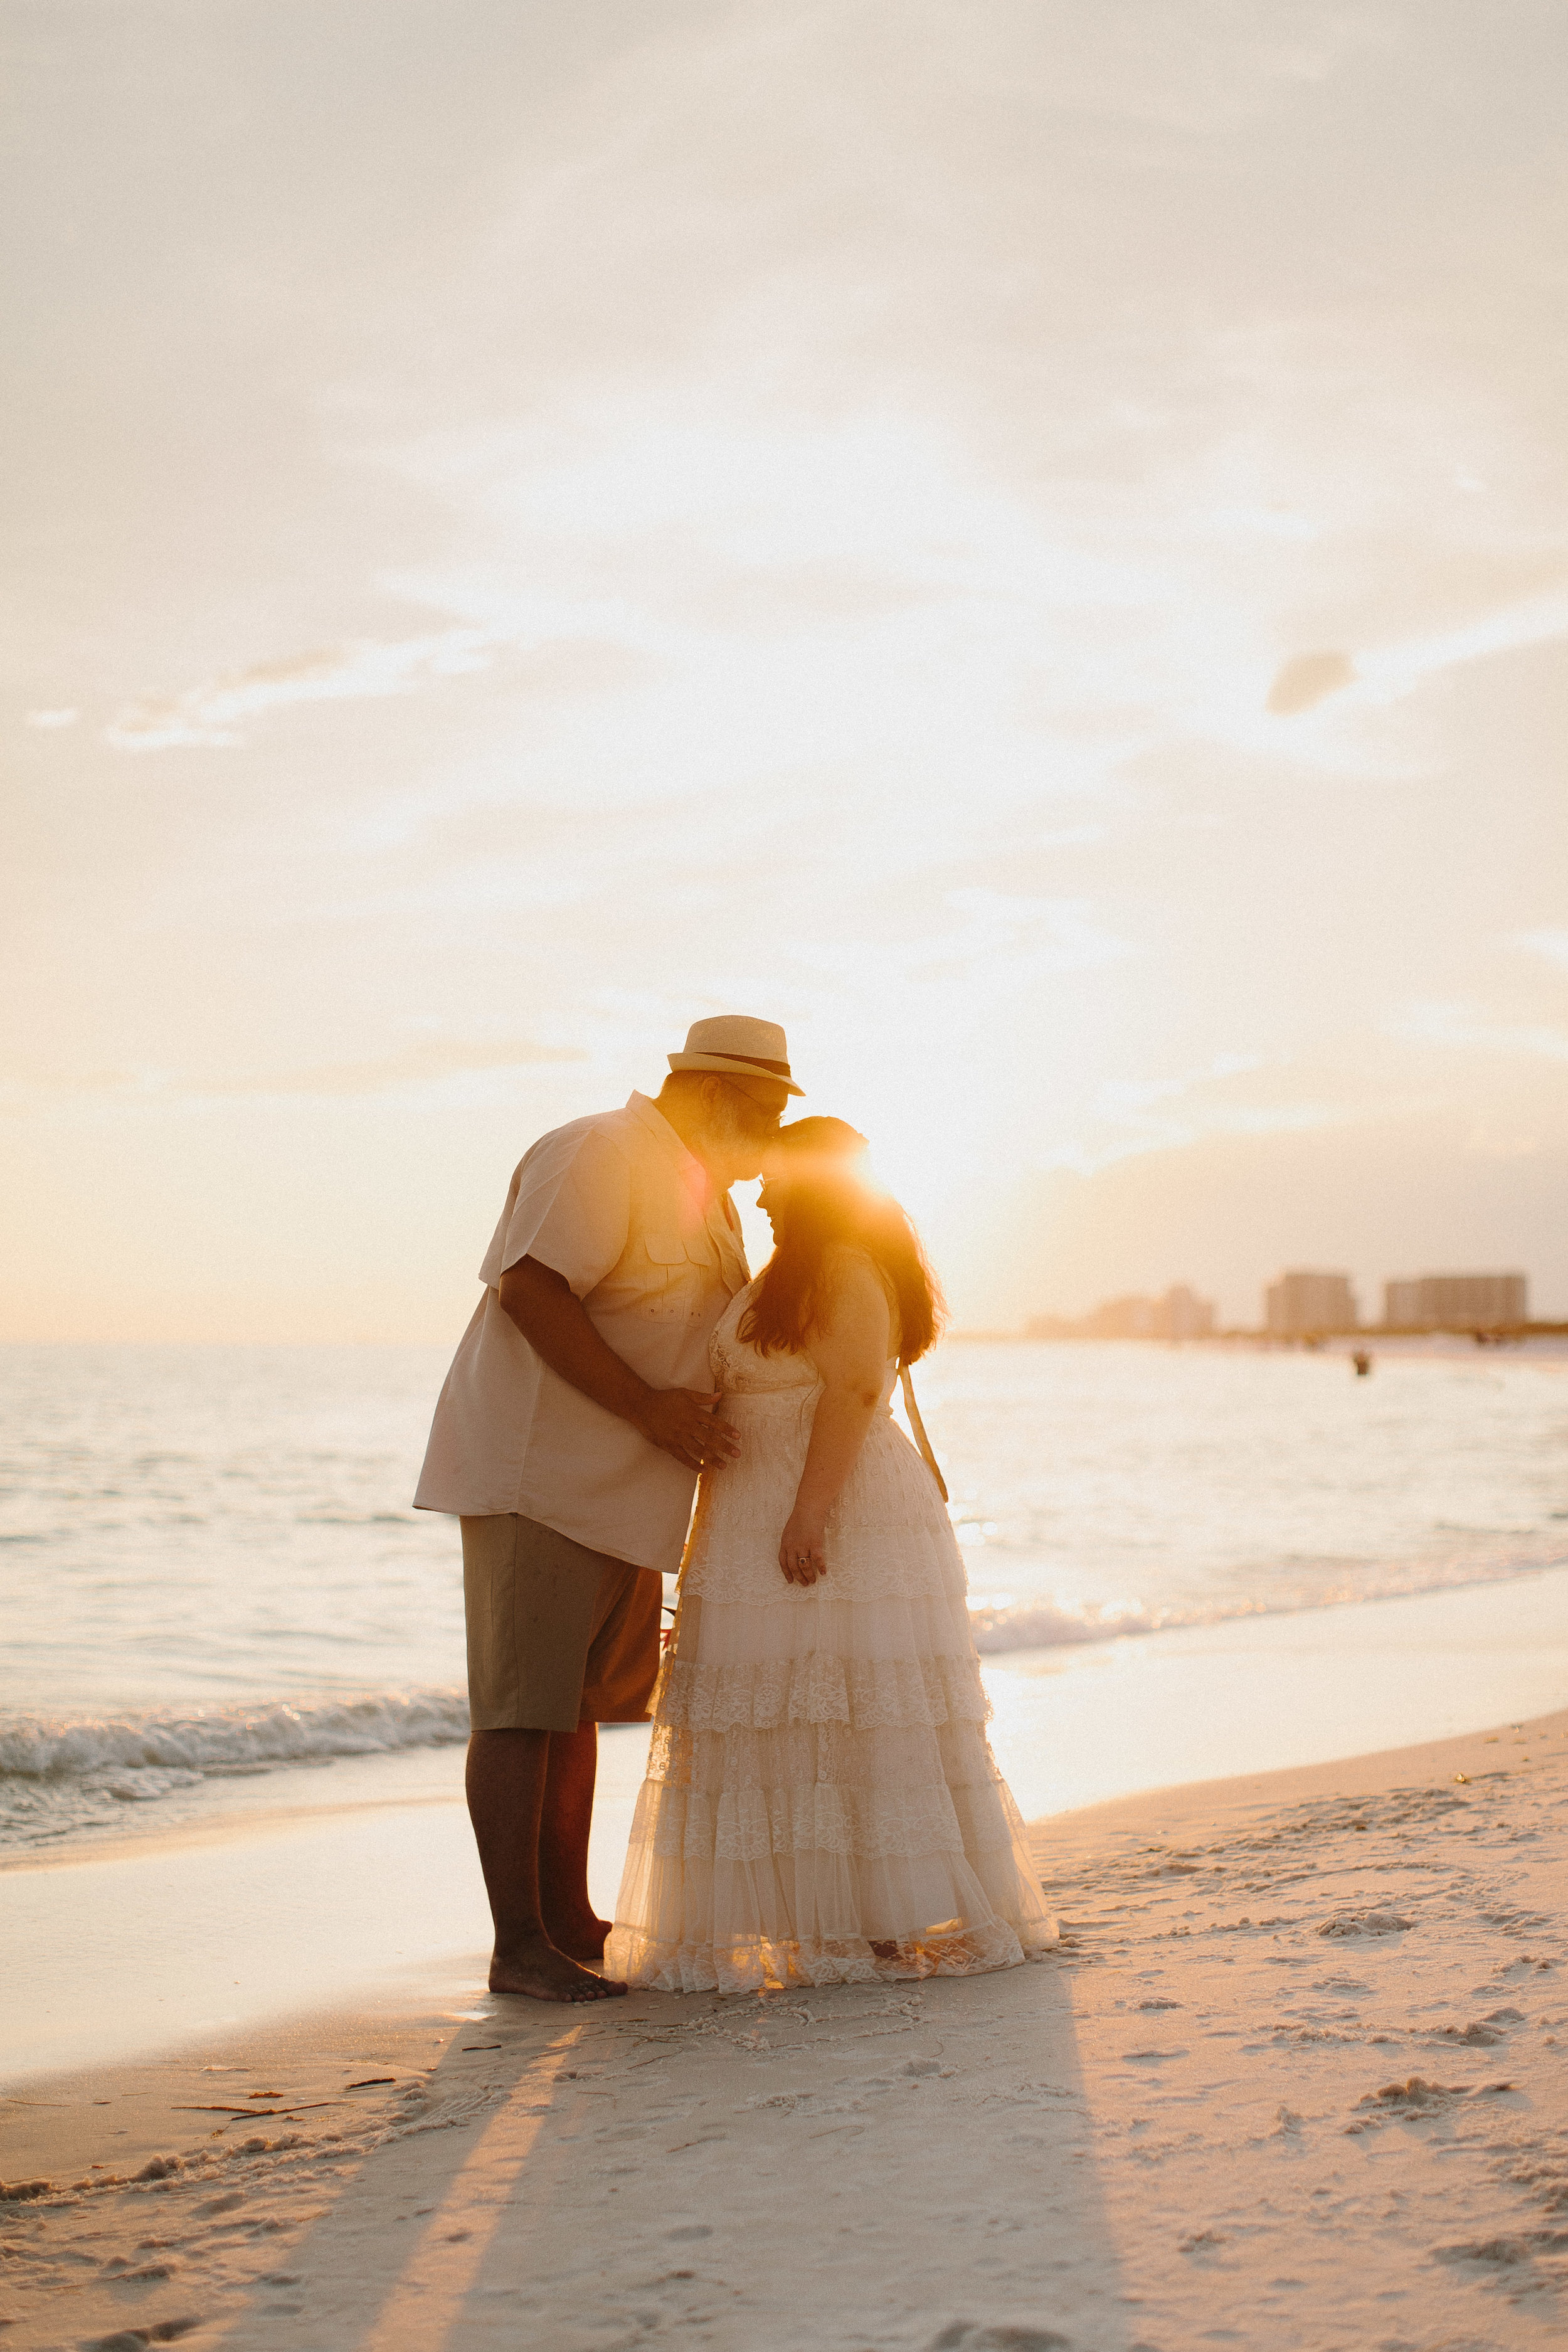 destin_sunset_beach_elopement_intimate_wedding_photographer_florida_documentary_1308.jpg